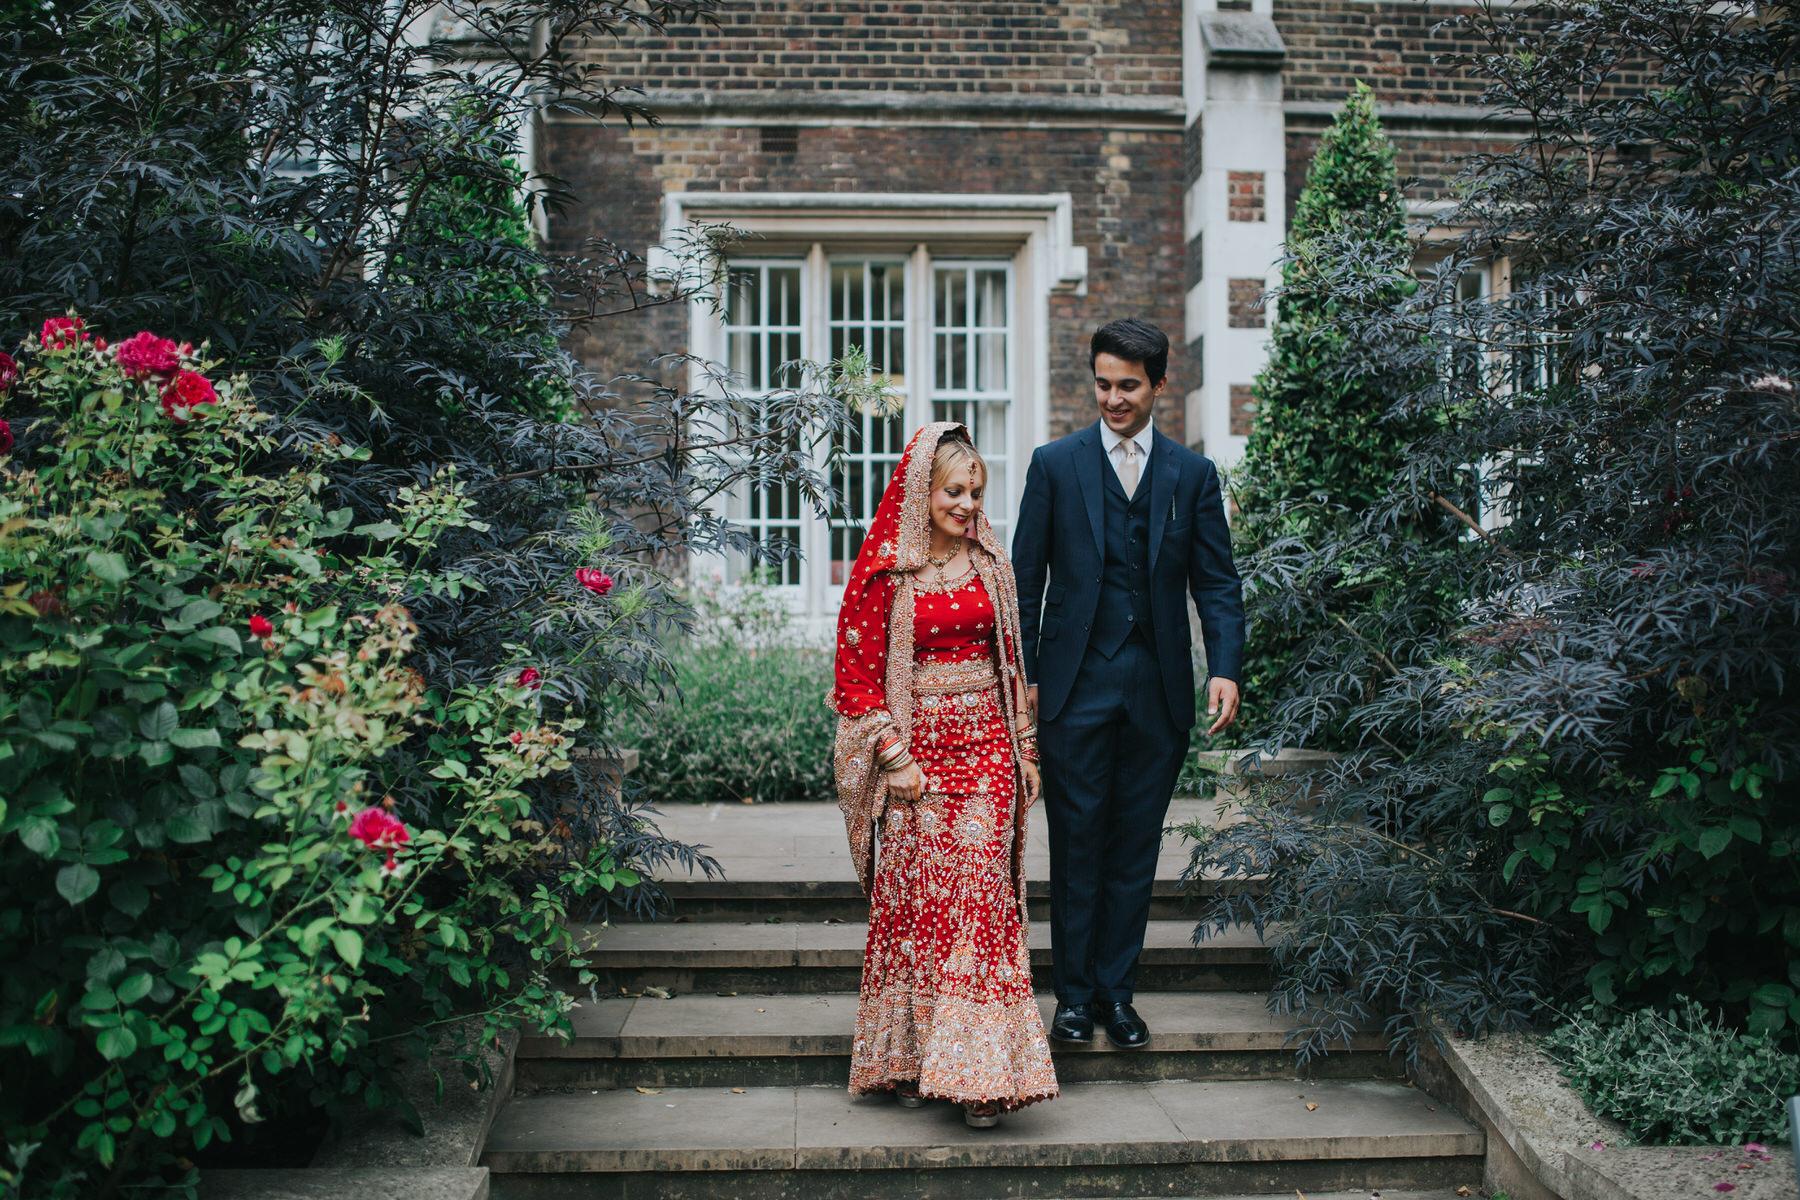 42-Anglo-Asian-London-Wedding-Middle-temple-bride-groom-walking-garden.jpg